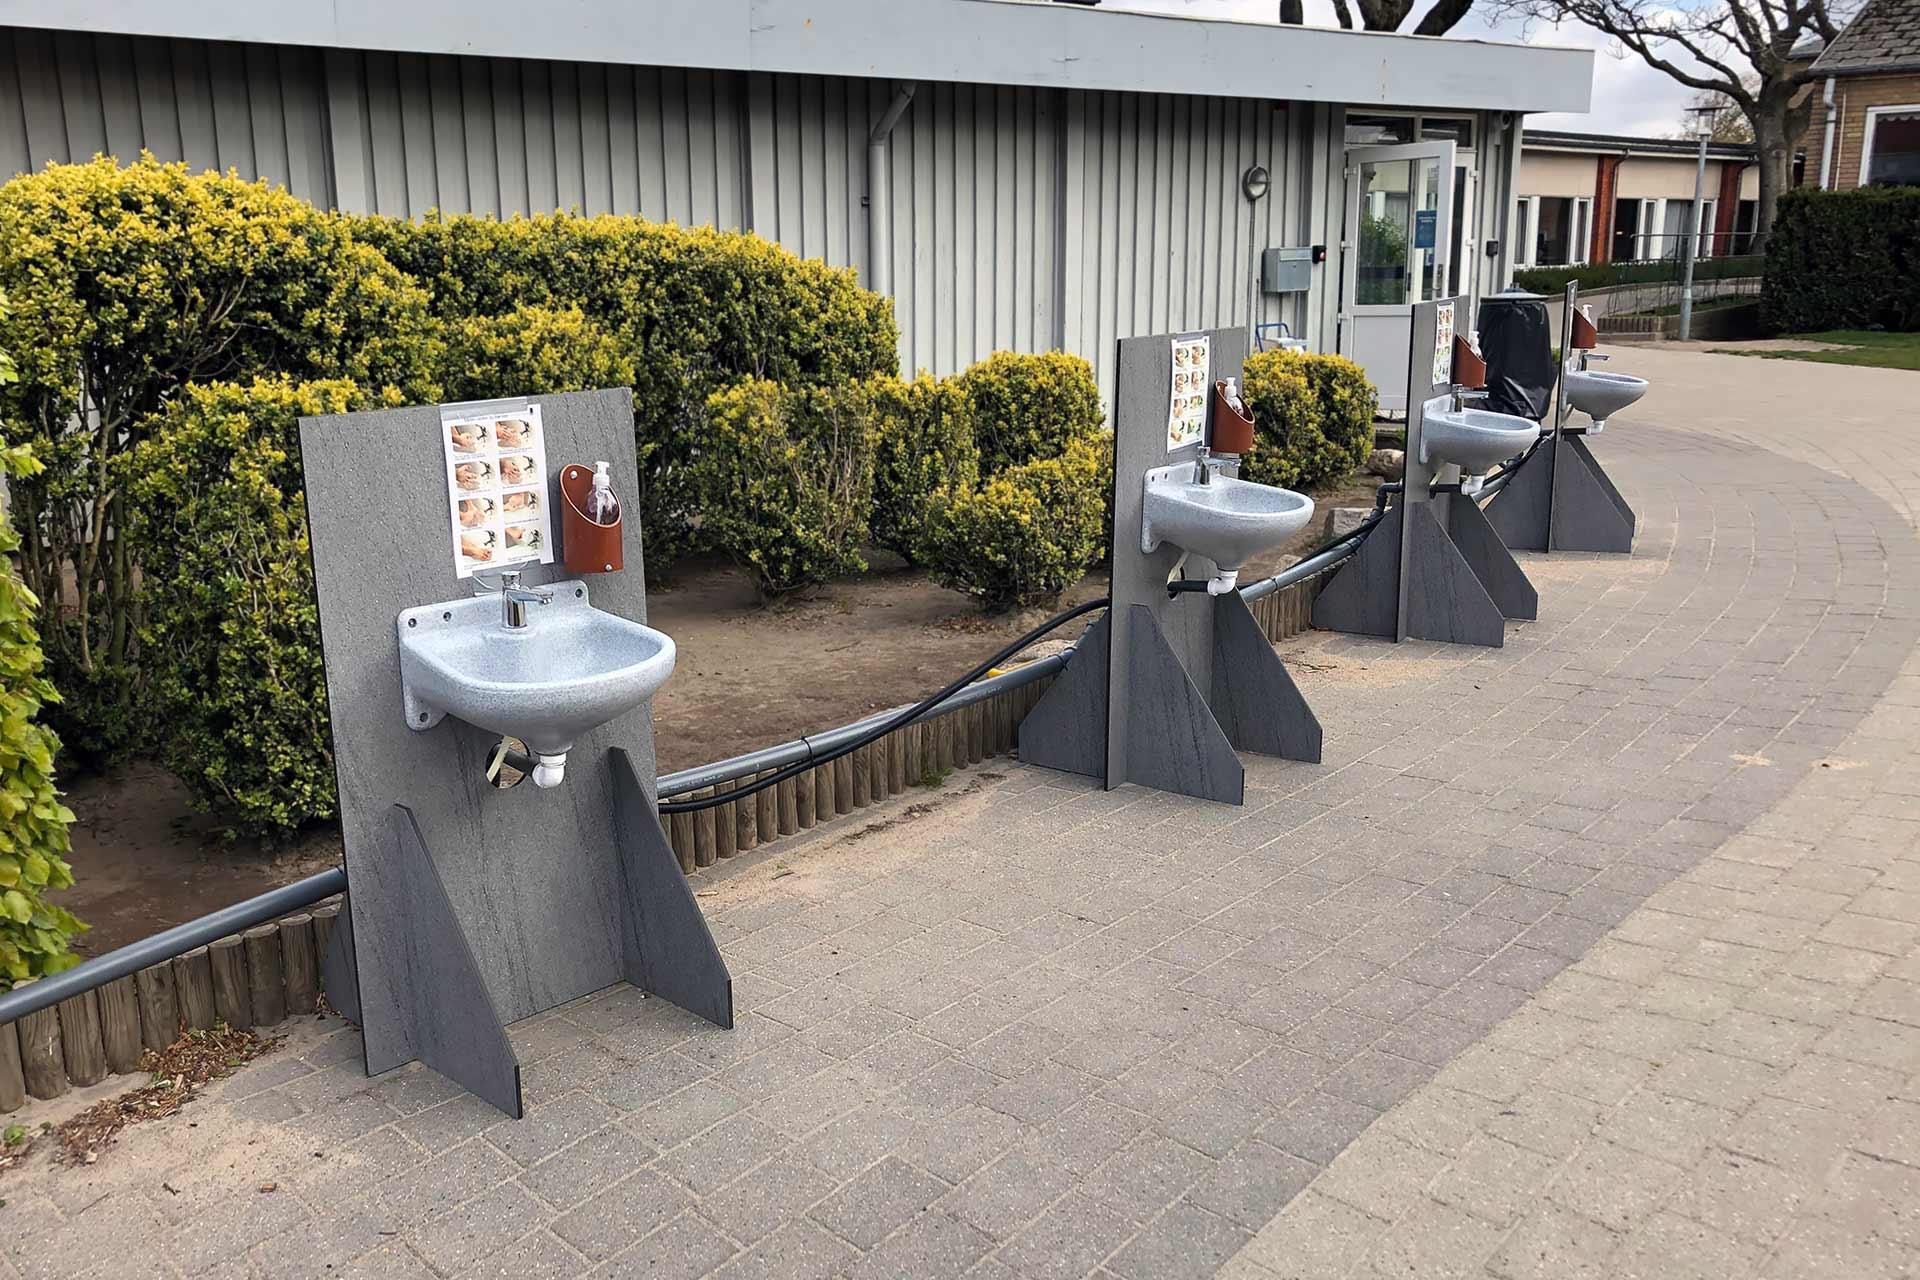 Mobile håndvaske